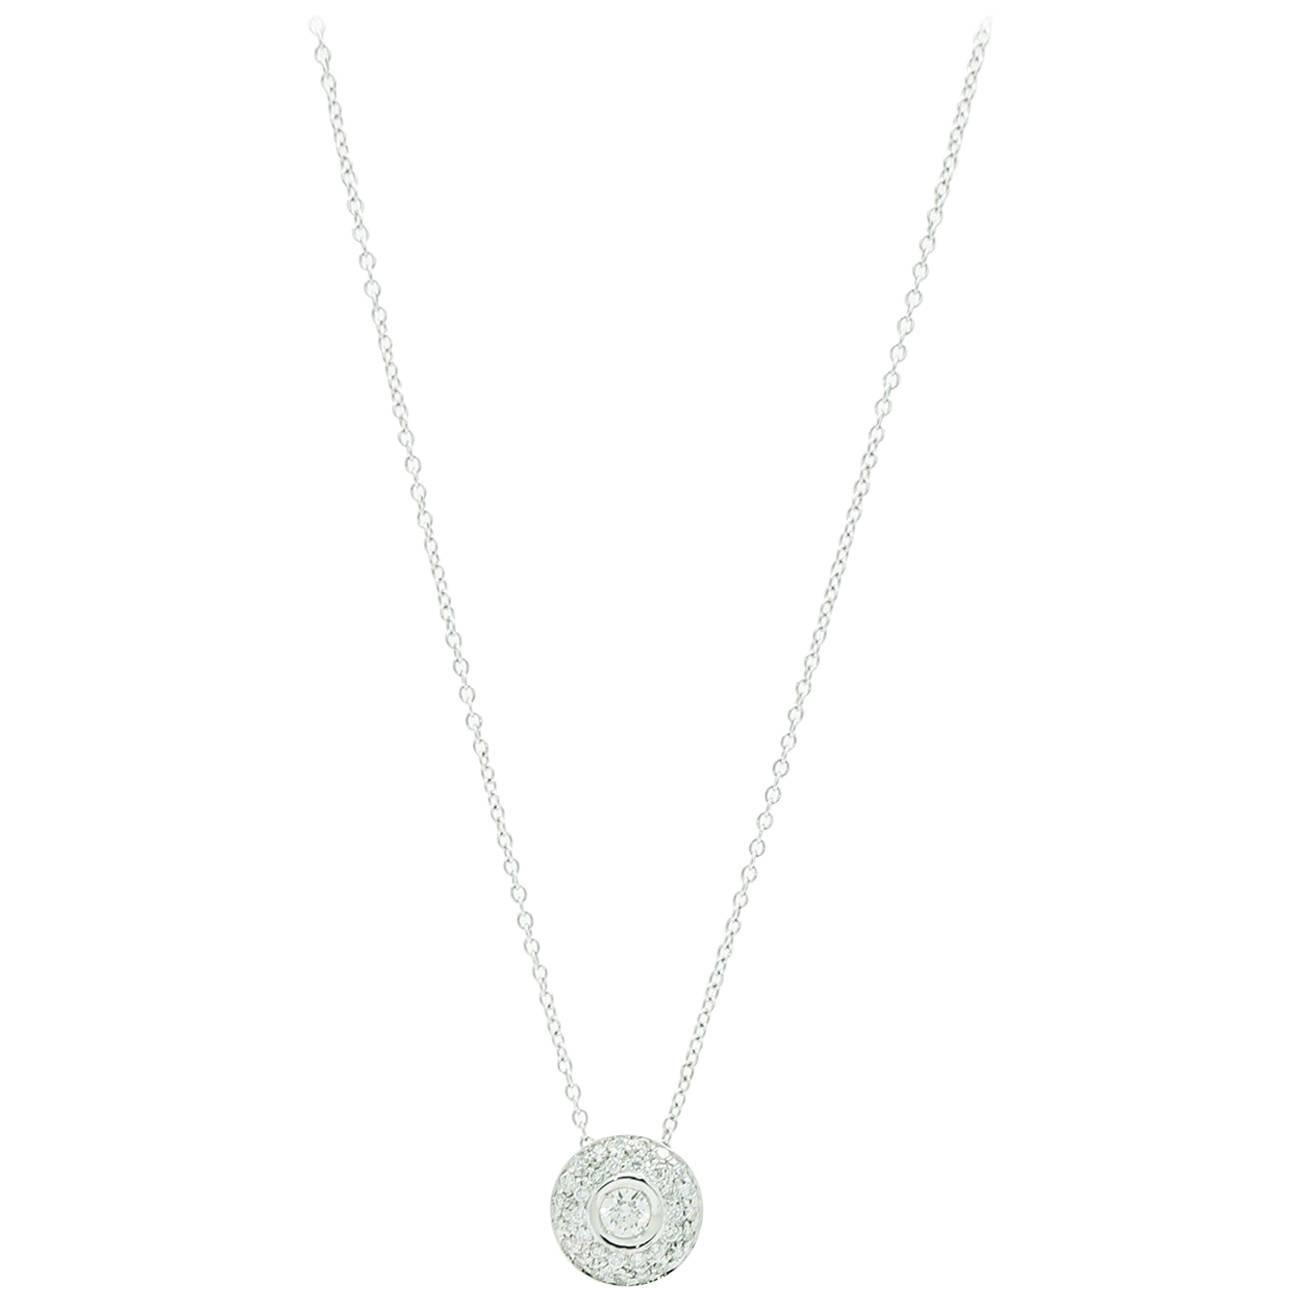 0.42 Carat Diamond 18k white Gold Necklace Pendant